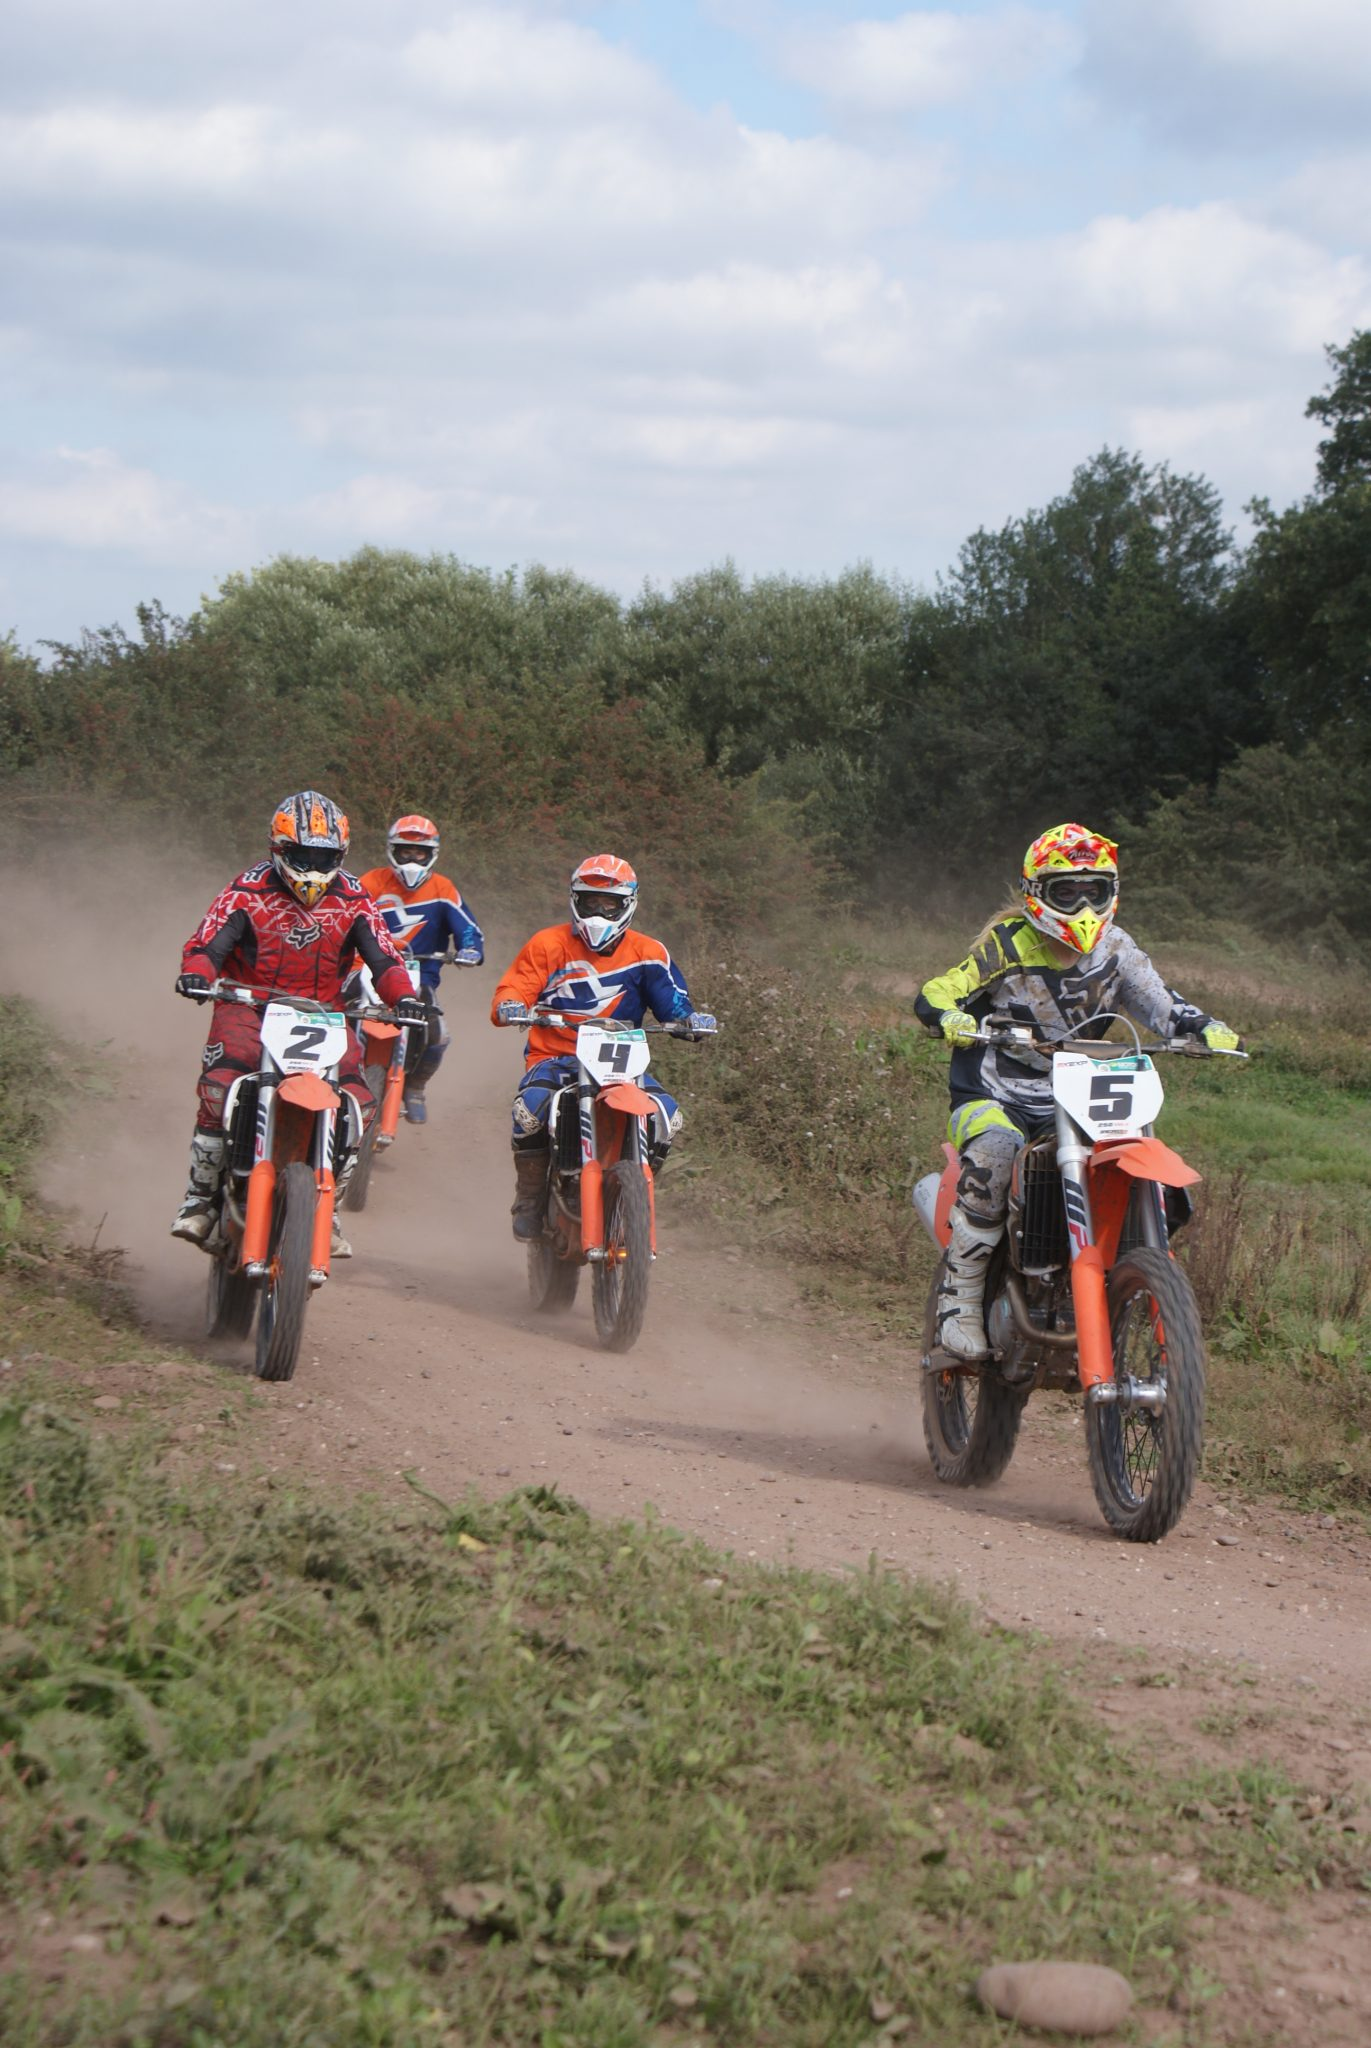 Motocross Experience Days – Dirt Biking & Trail Riding